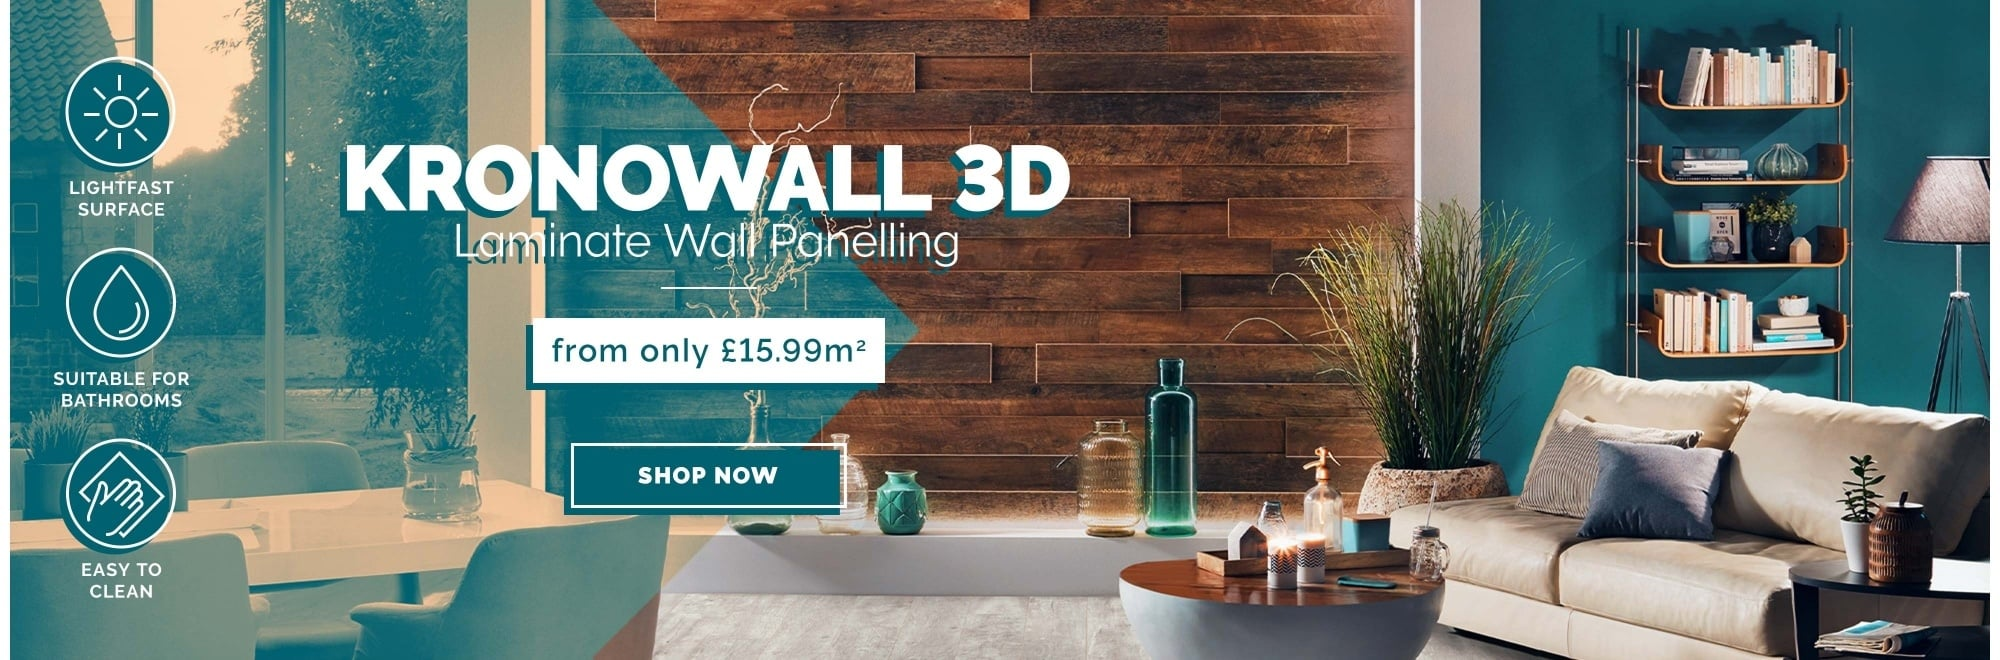 Kronowall 3D wall panelling